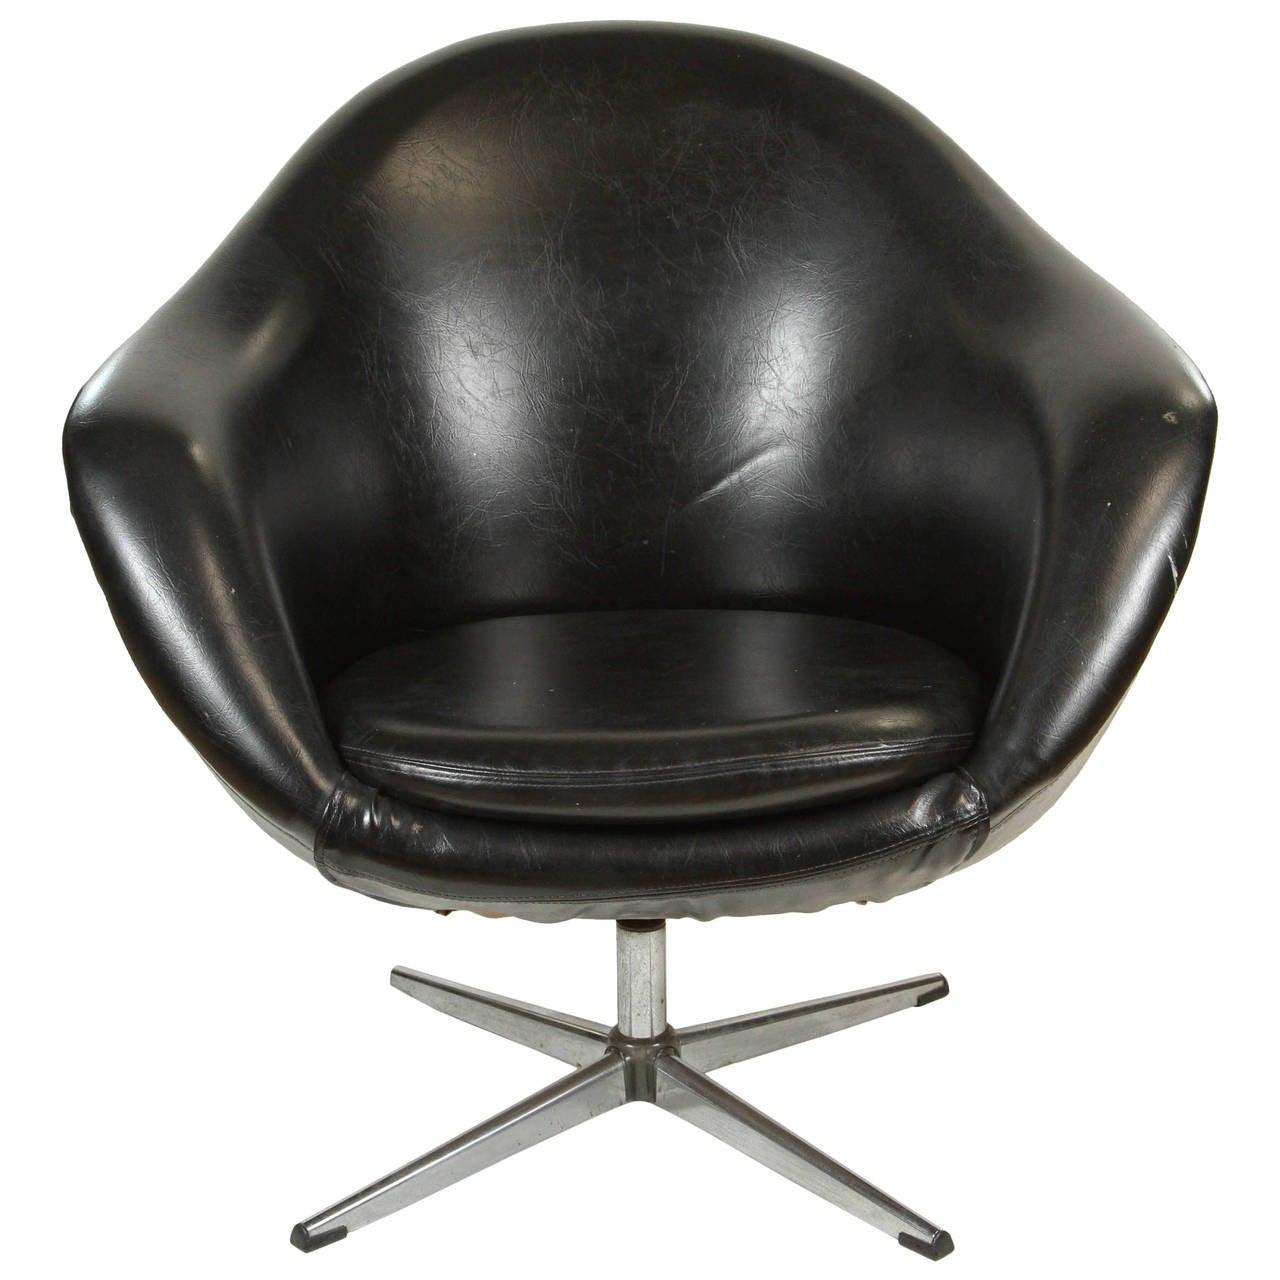 swivel chair black joovy high reviews 1960s egg in vinyl at 1stdibs